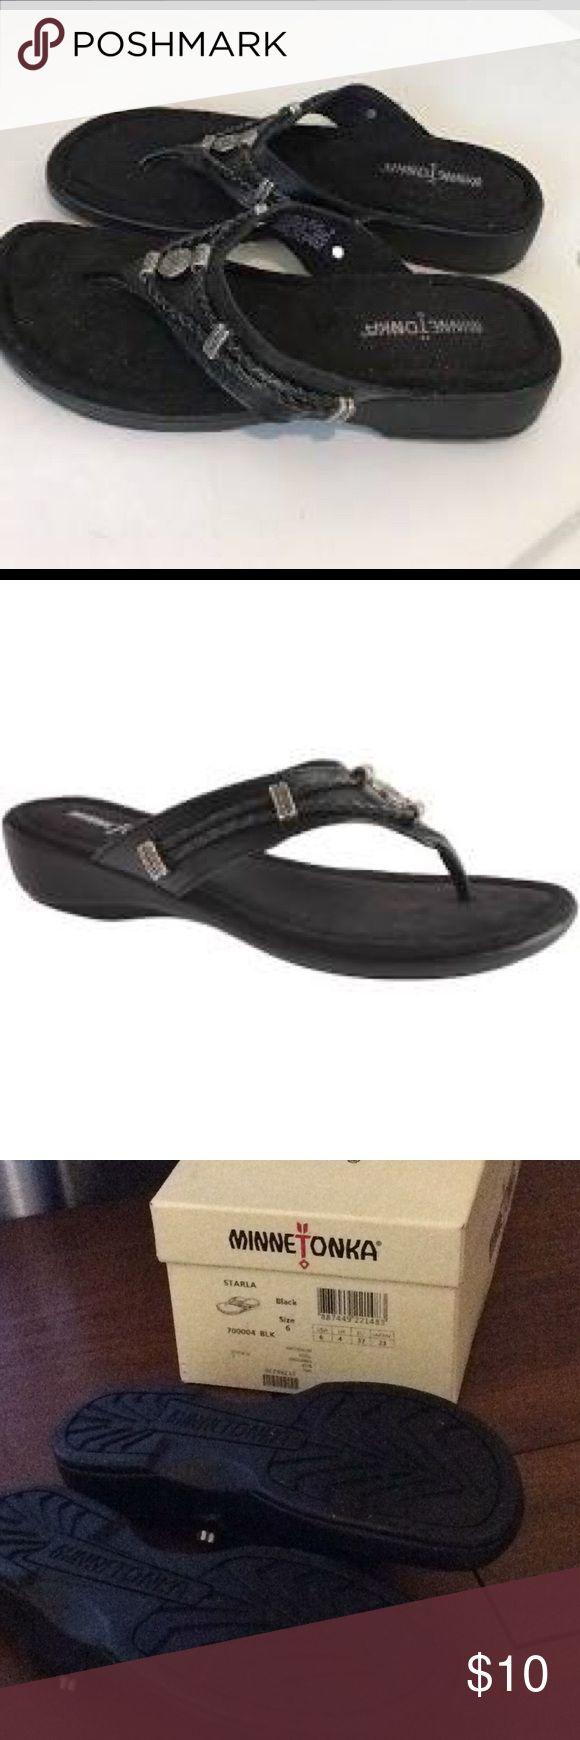 New Minnetonka sandals with box Very good quality sandals Minnetonka Shoes Flats & Loafers